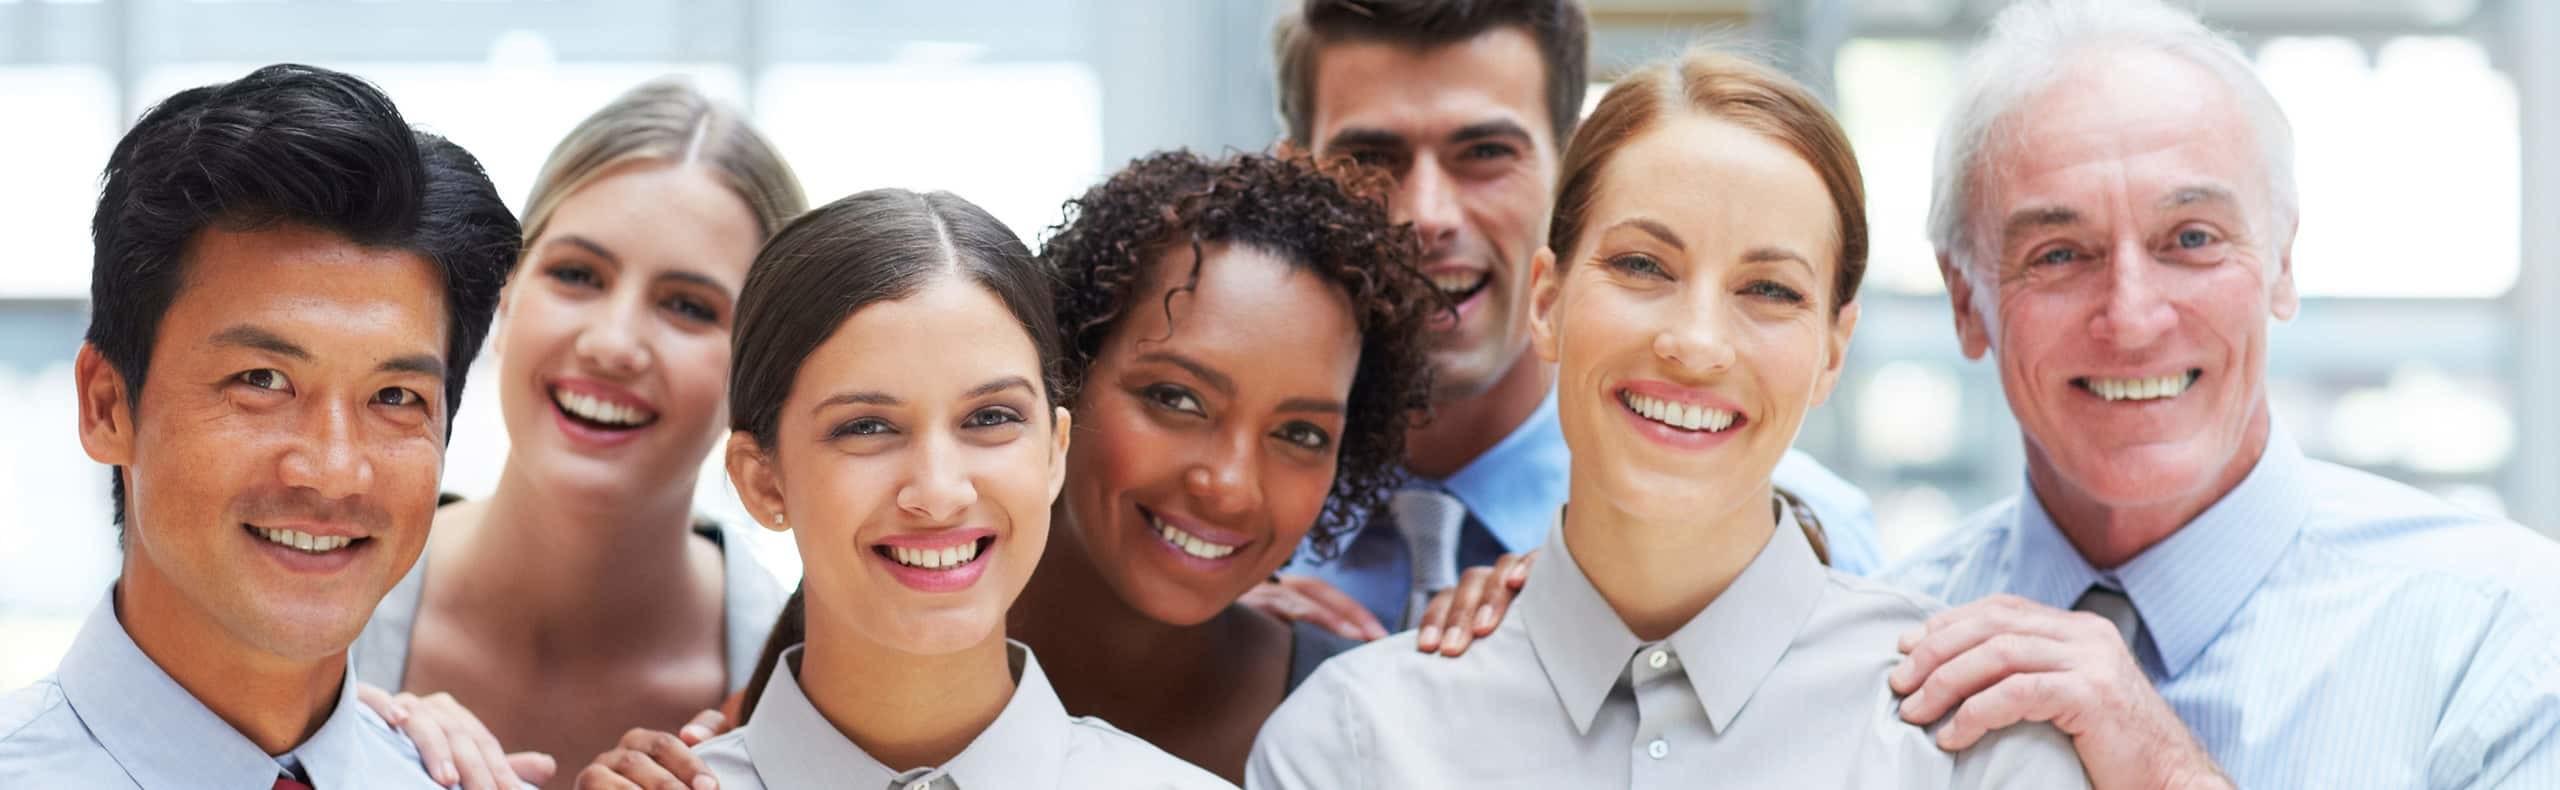 Employment agency insurance